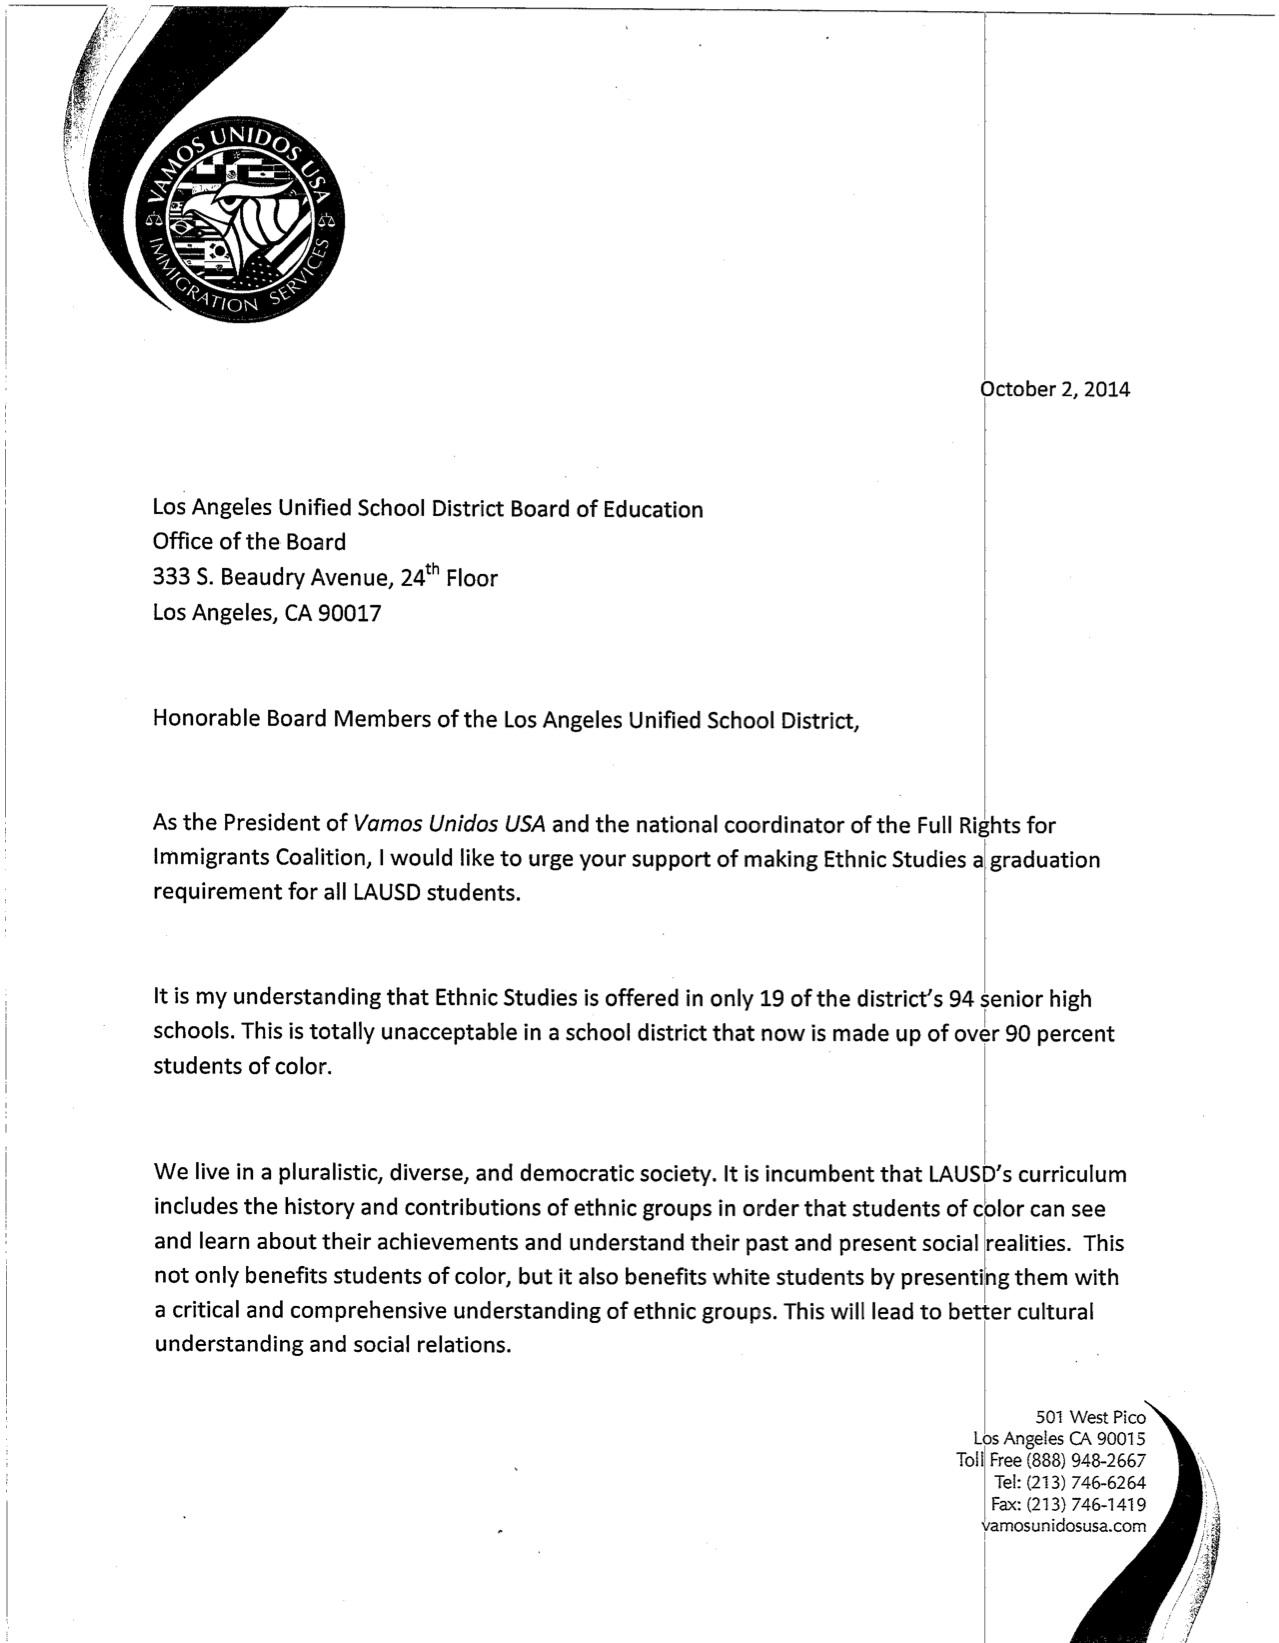 Letter_10-03-14_Juan_Jose_Gutierrez_p1.jpg